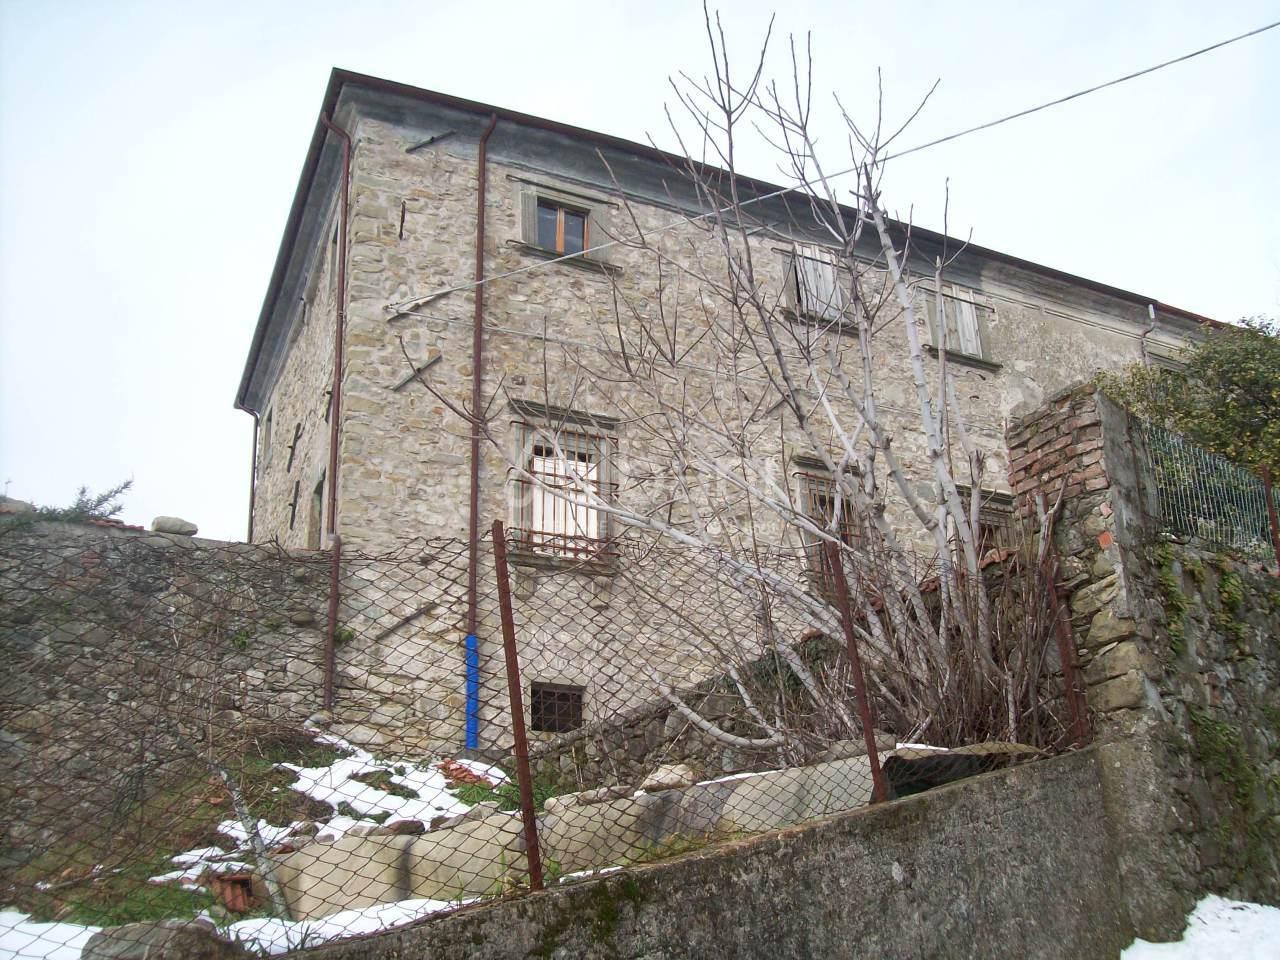 Indipendente - Casale a Serravalle, Filattiera